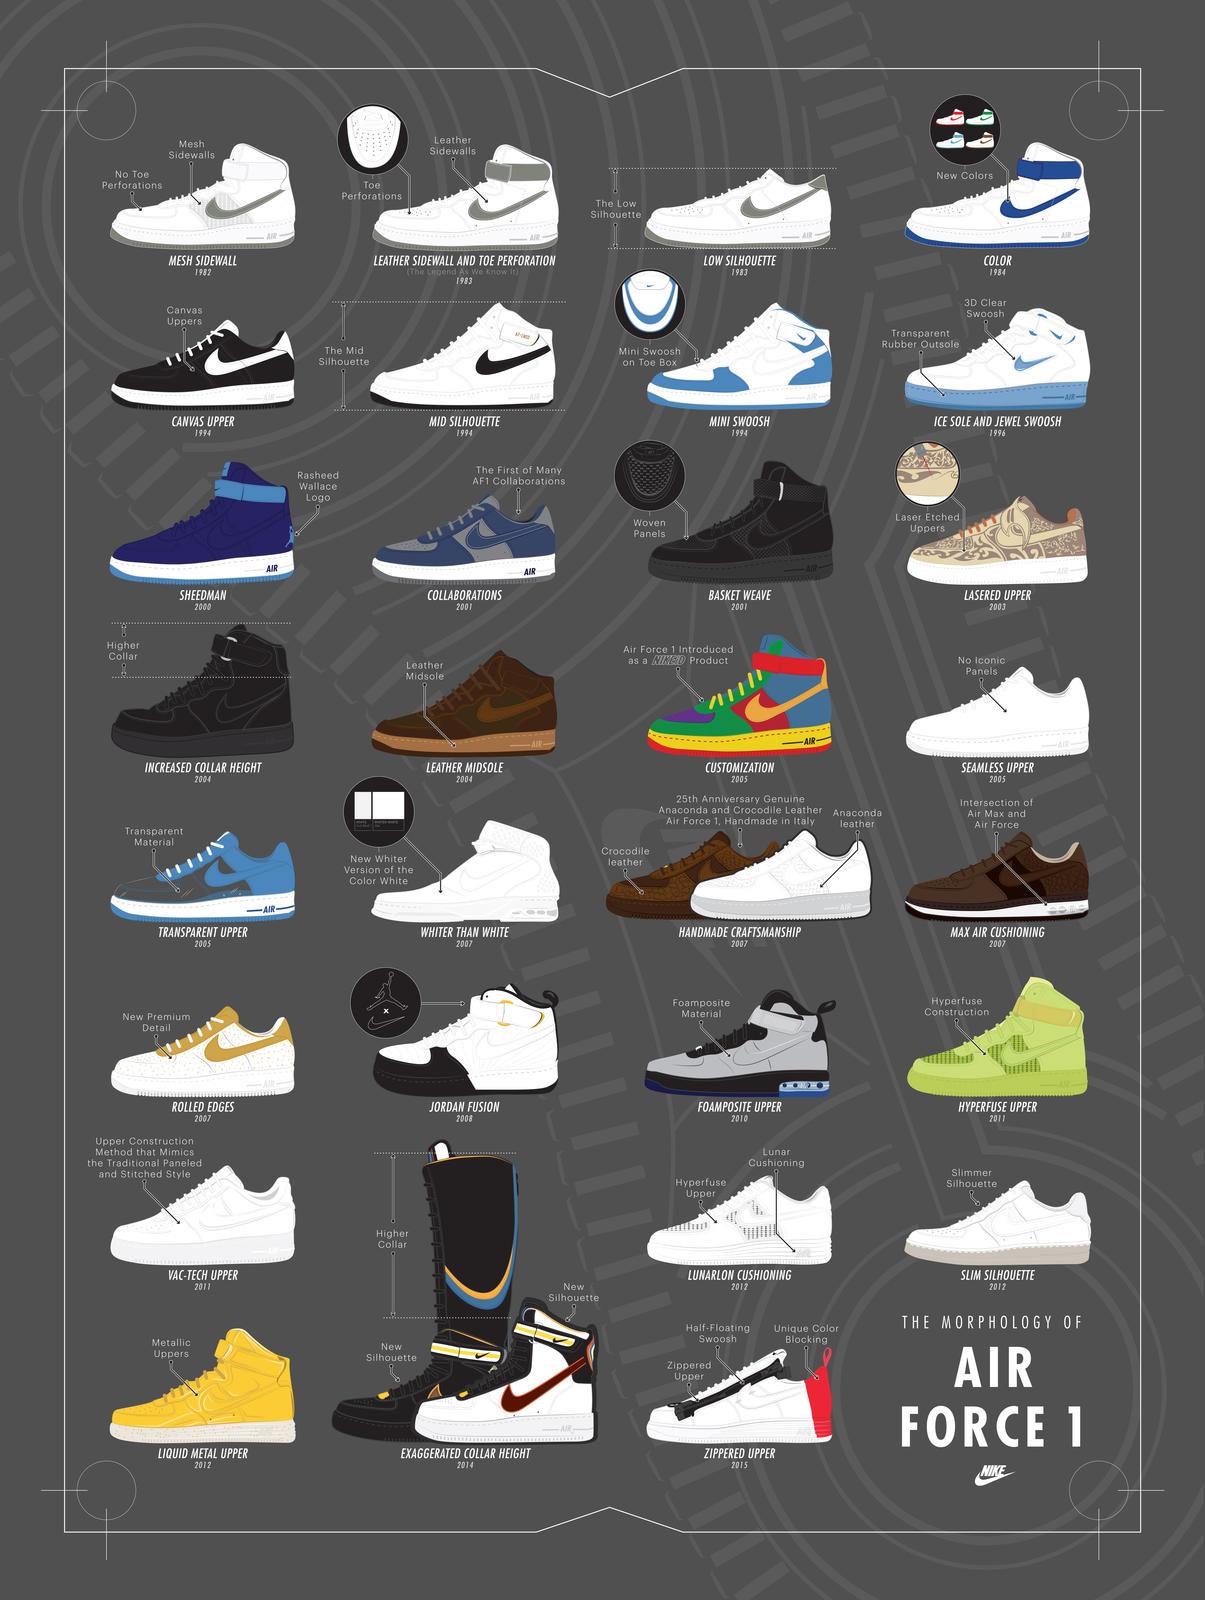 Nike Morphology Of Air Force 1   Poster Original Port